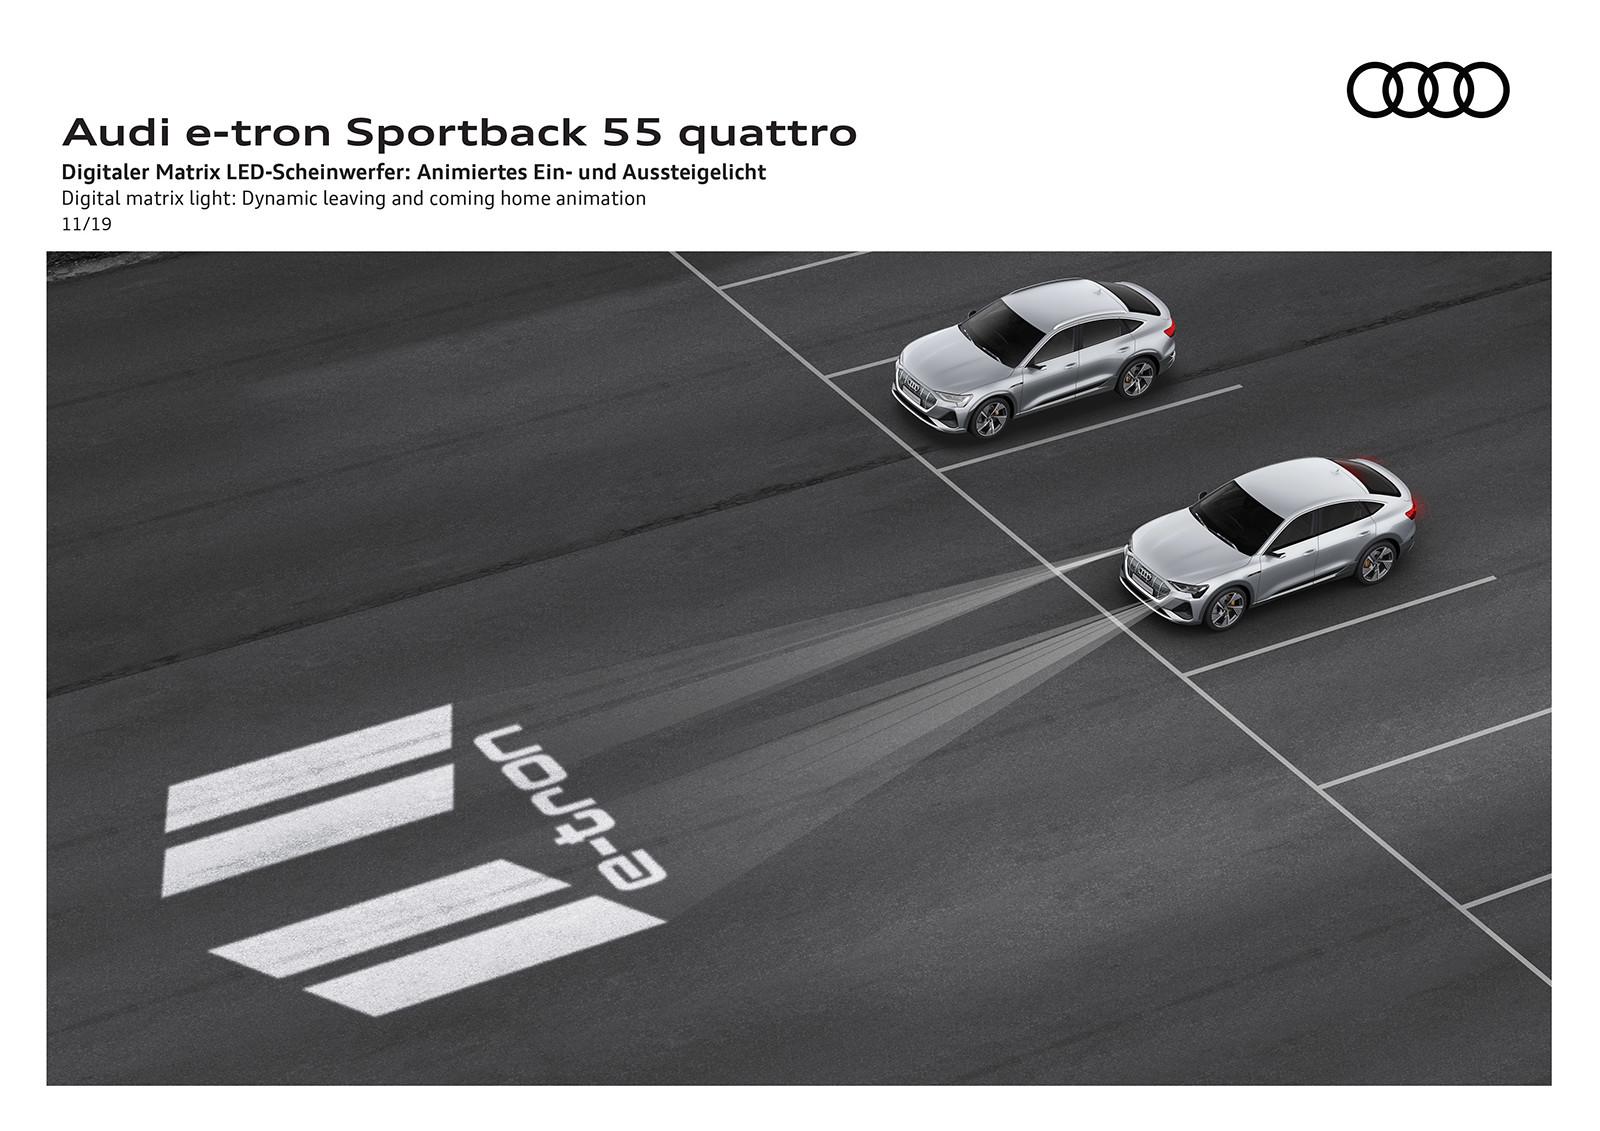 Foto de Audi e-tron Sportback (56/57)